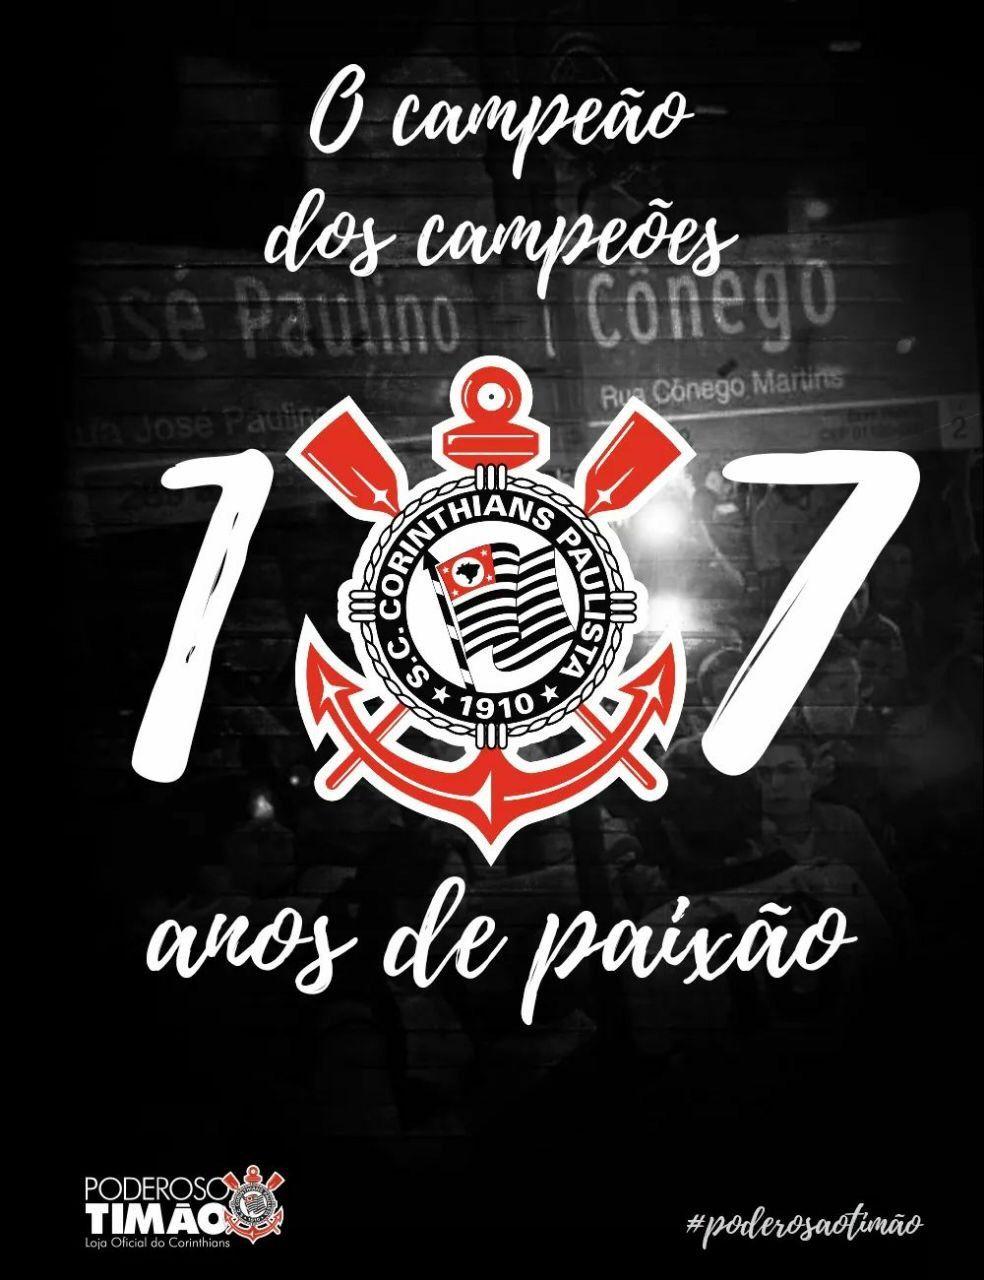 8d52fb5ea98f8 Pin de sport club corinthians paulista em pinterest jpg 984x1280 Clube  corinthians site oficial